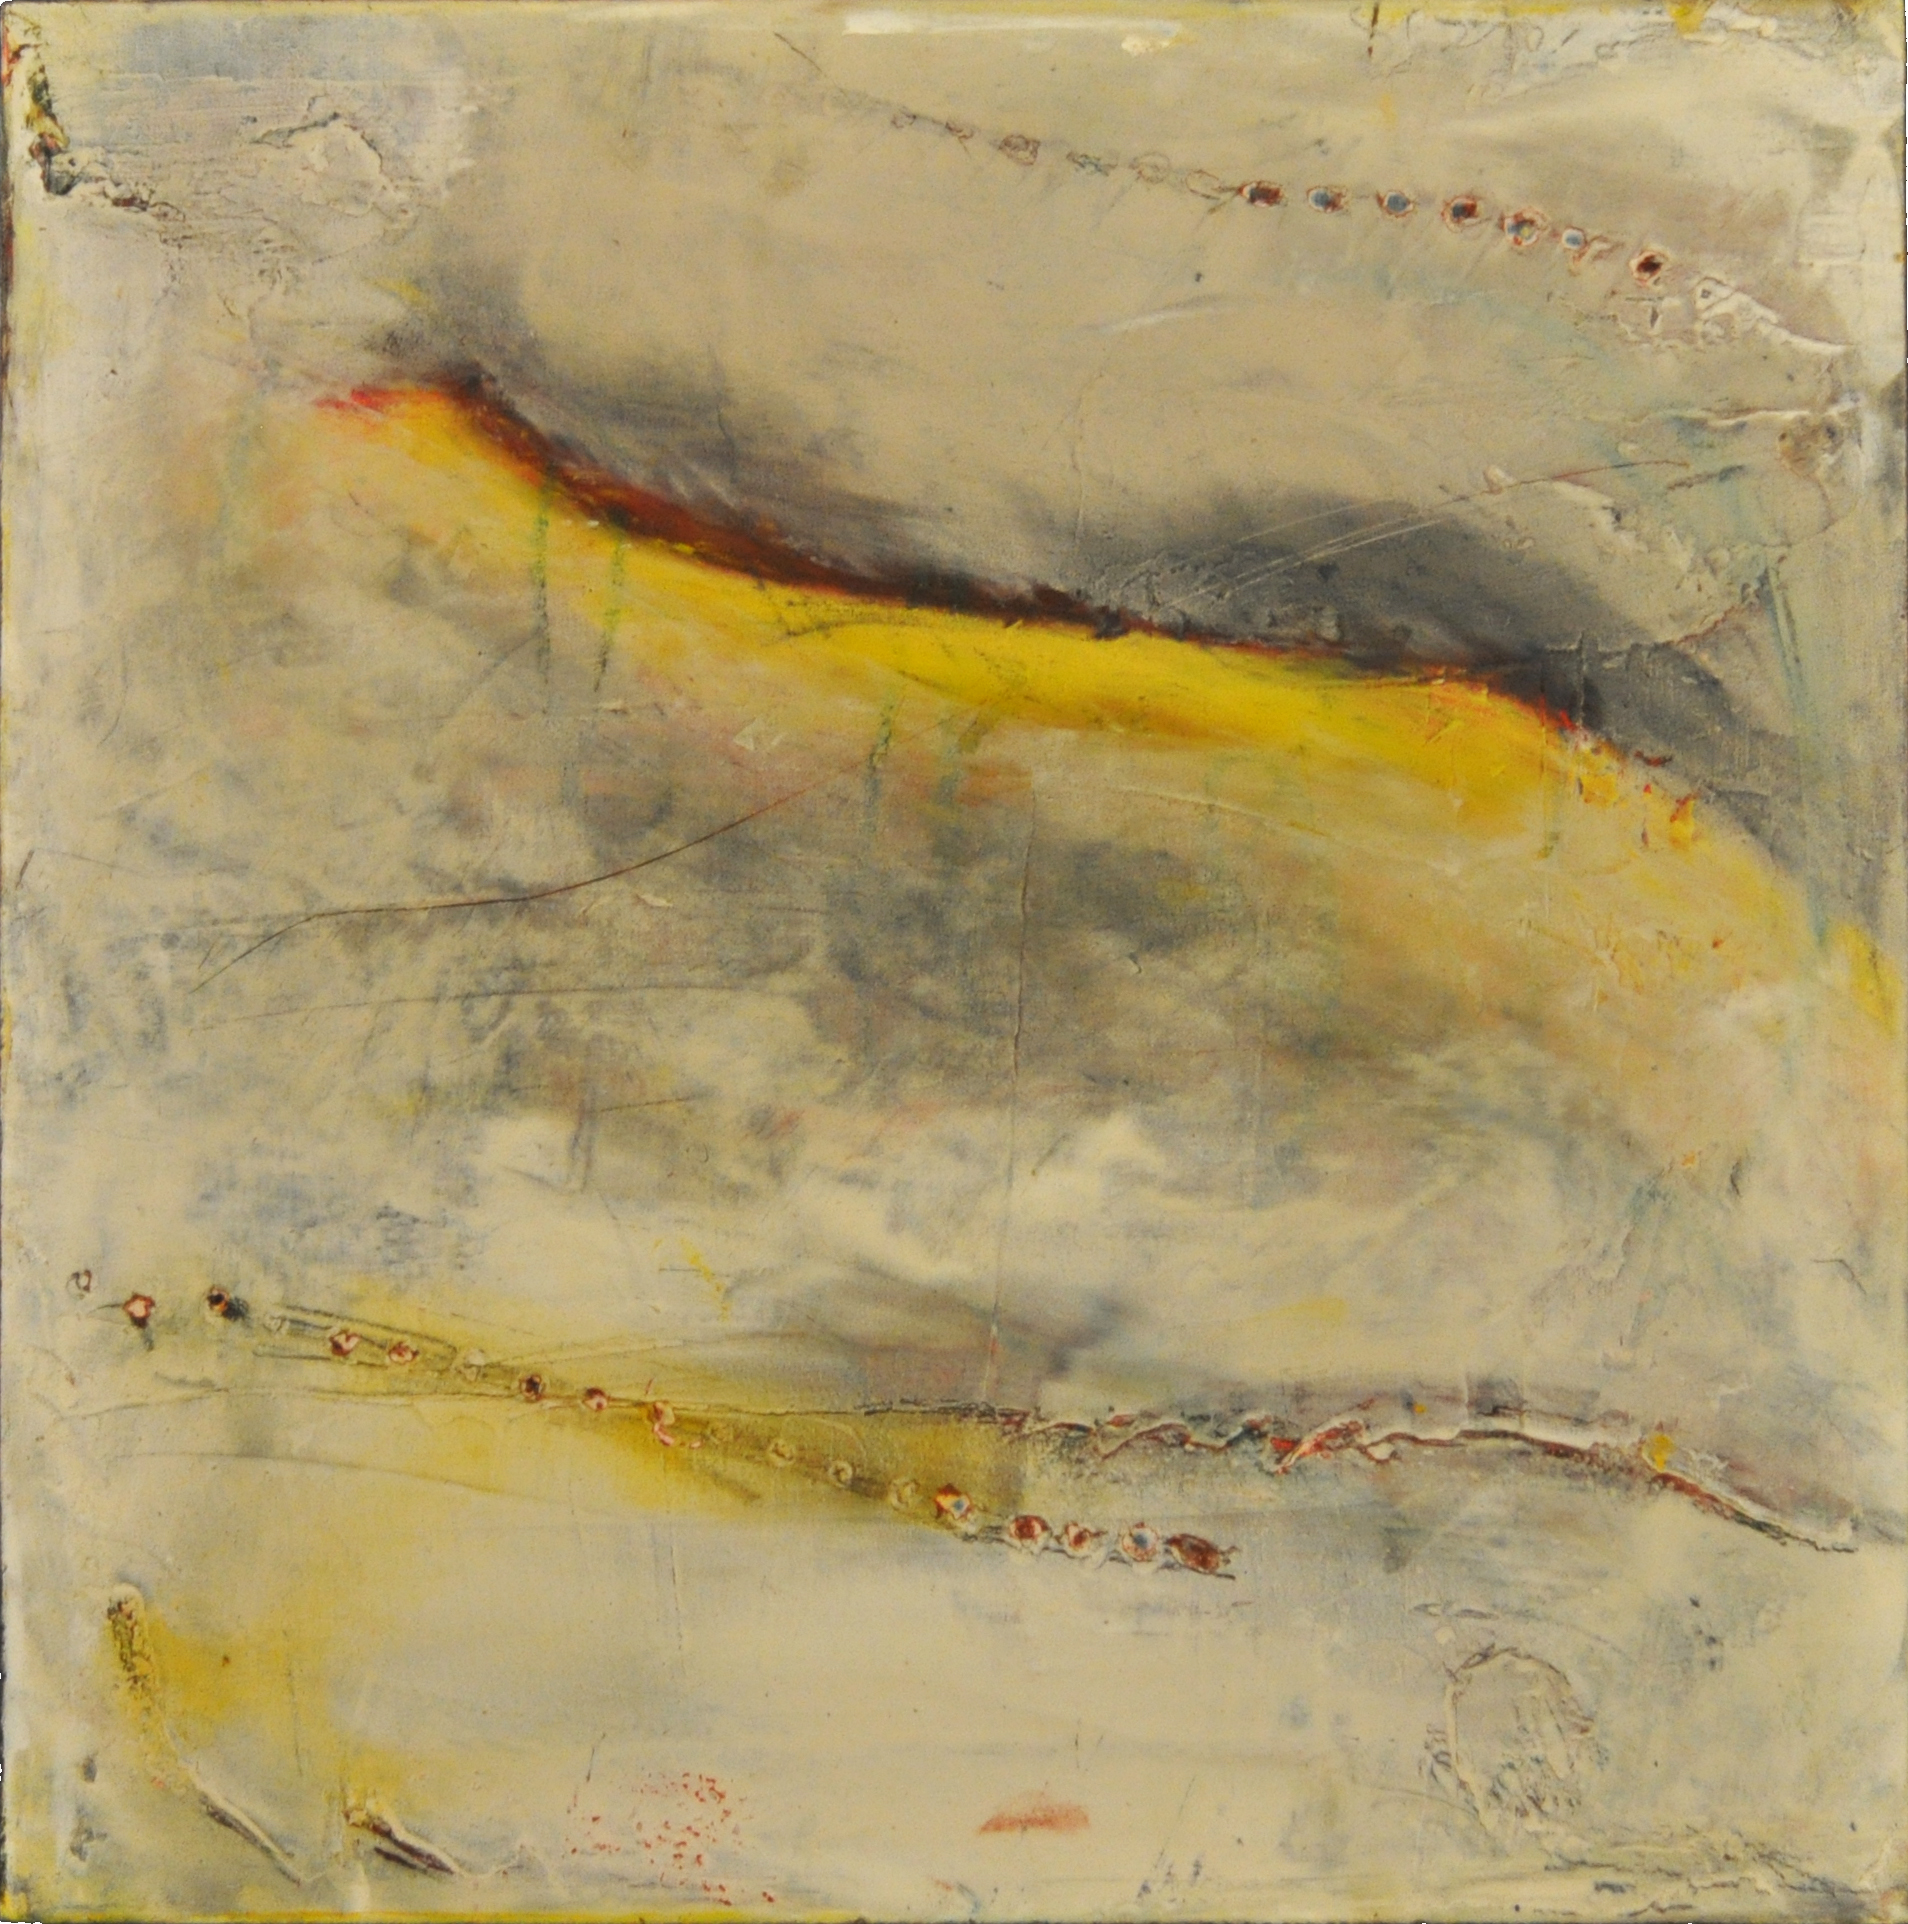 threadbare   oil and cold wax 10 x 10 inches 2014